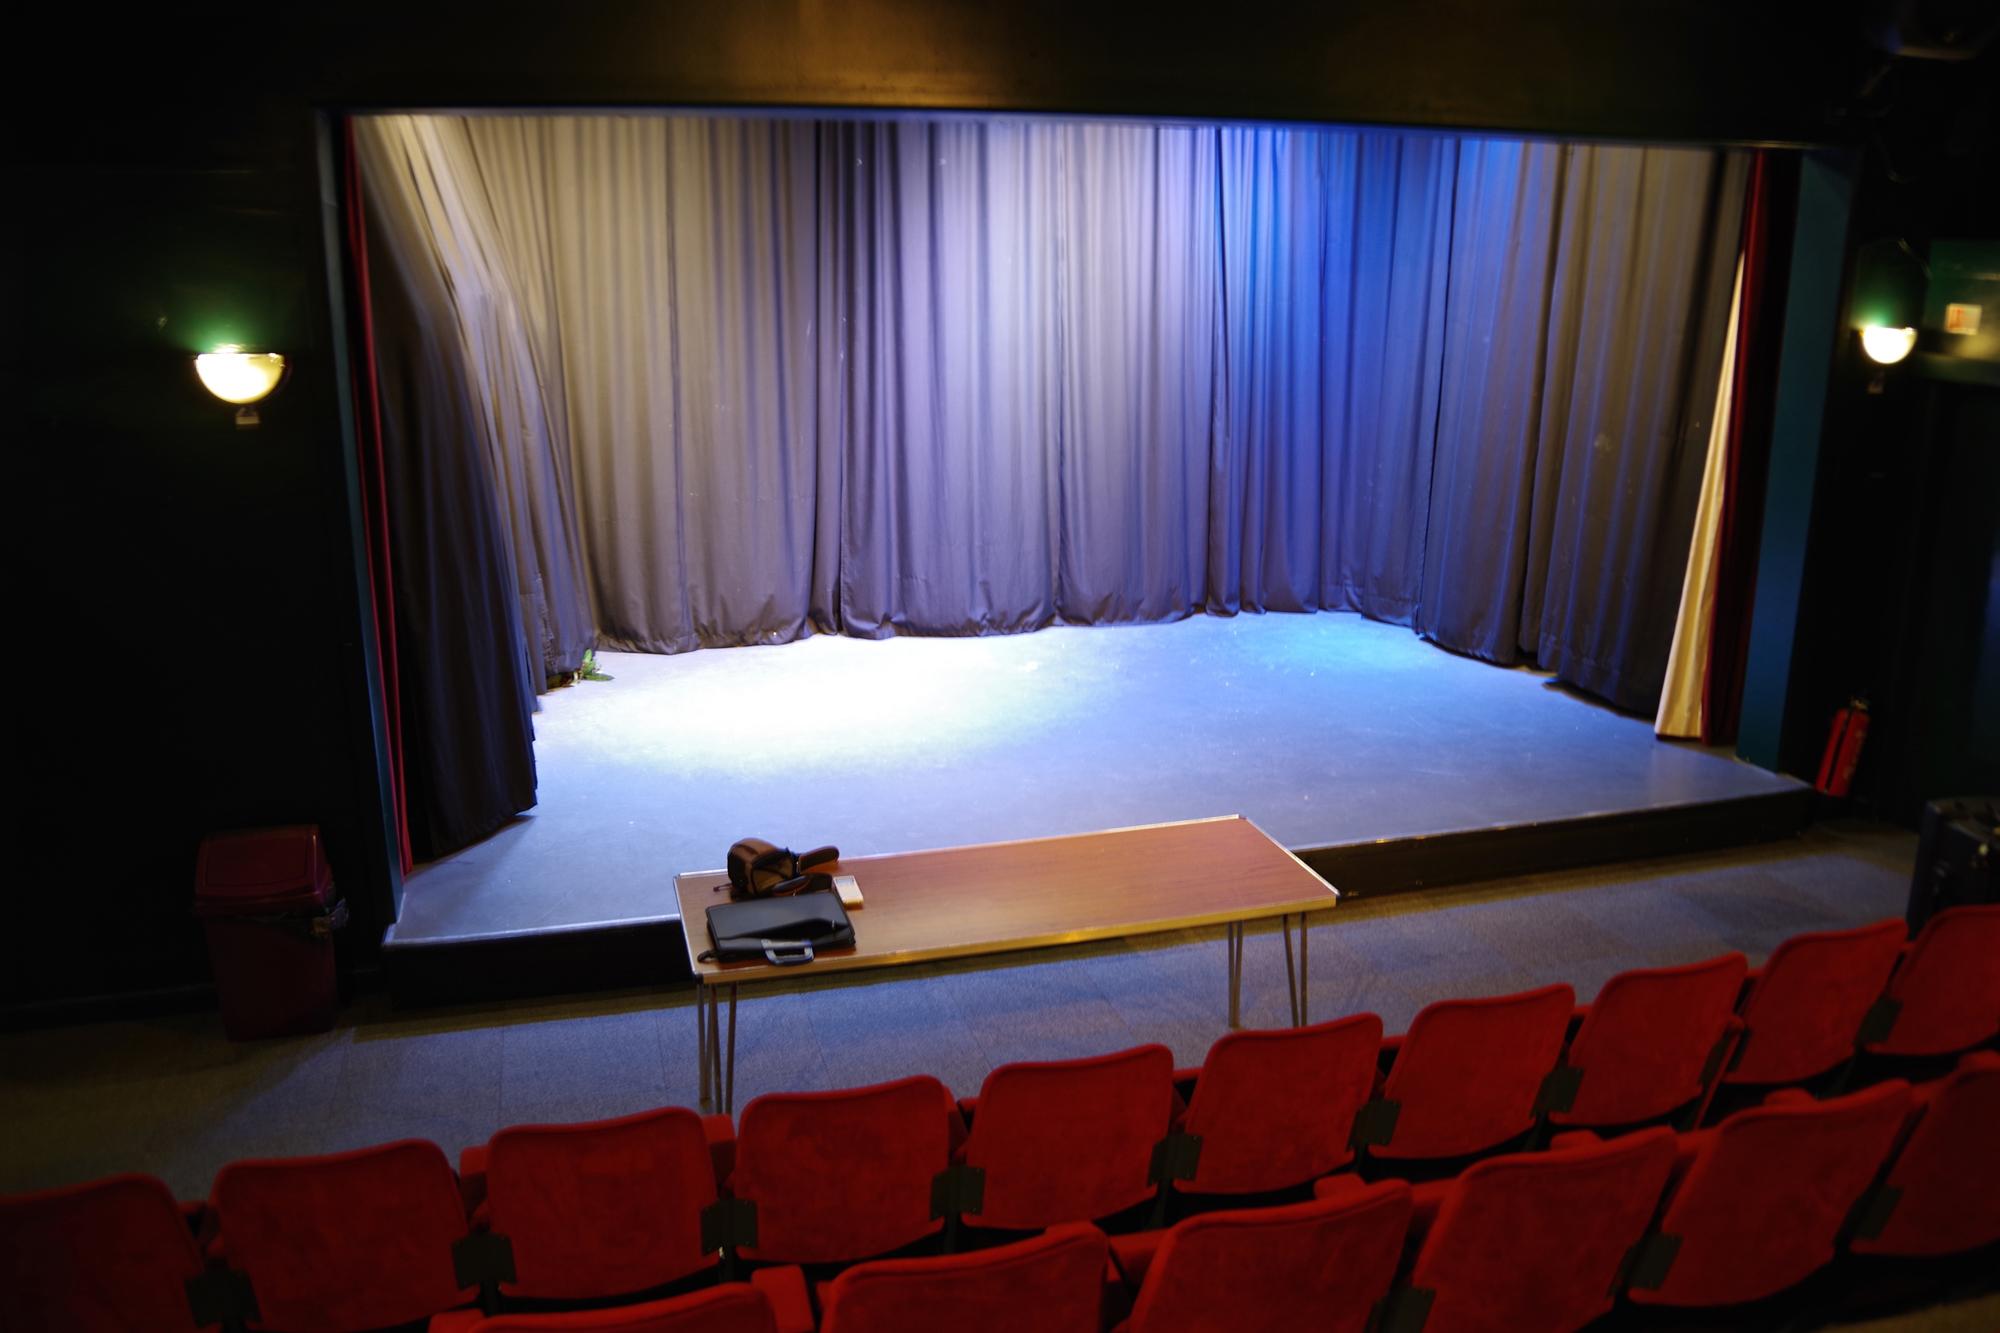 theatreseats2.jpg